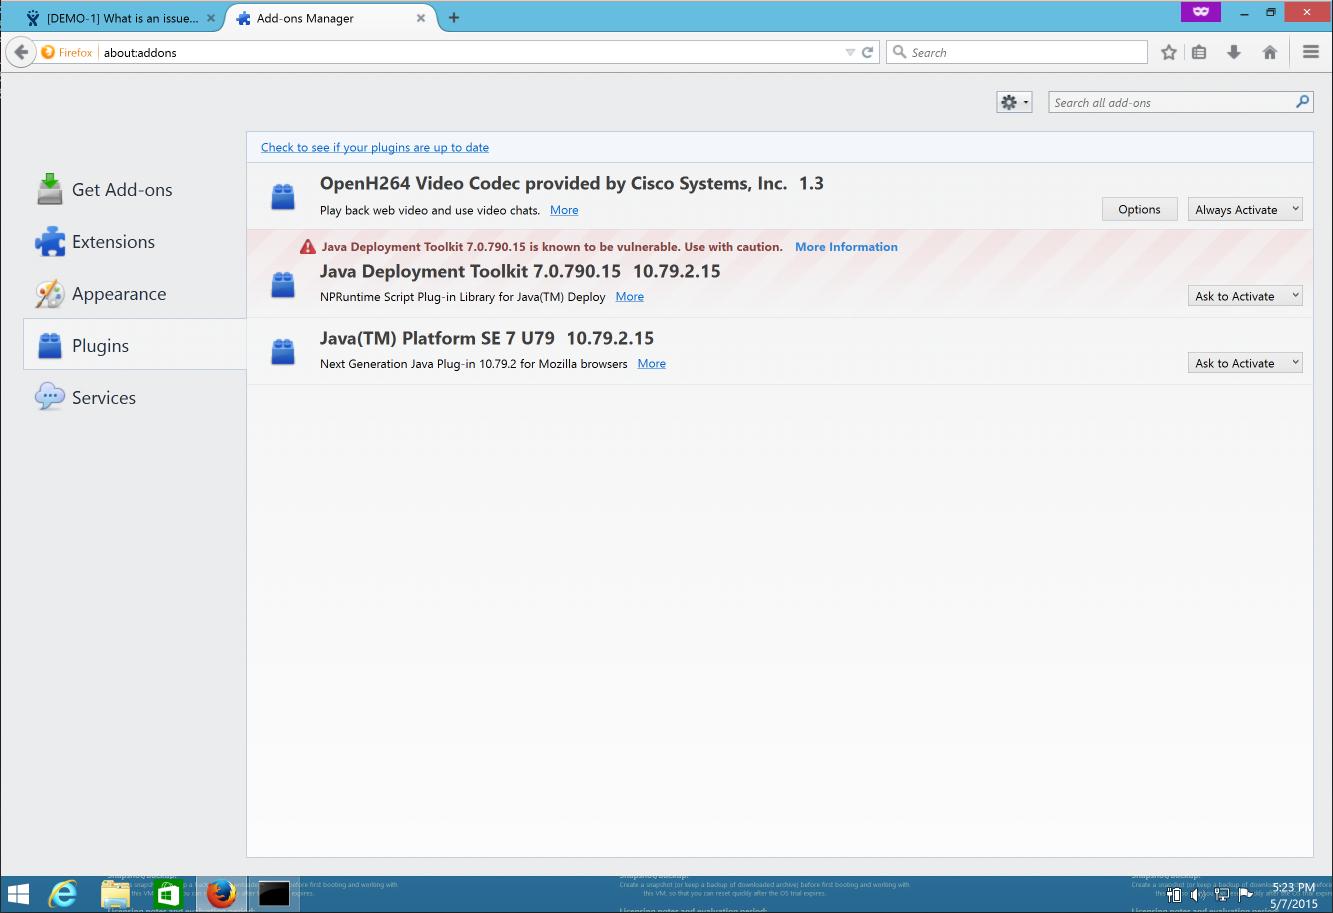 JRASERVER-43266] Java Deployment Toolkit , Pop up JAVA plugin